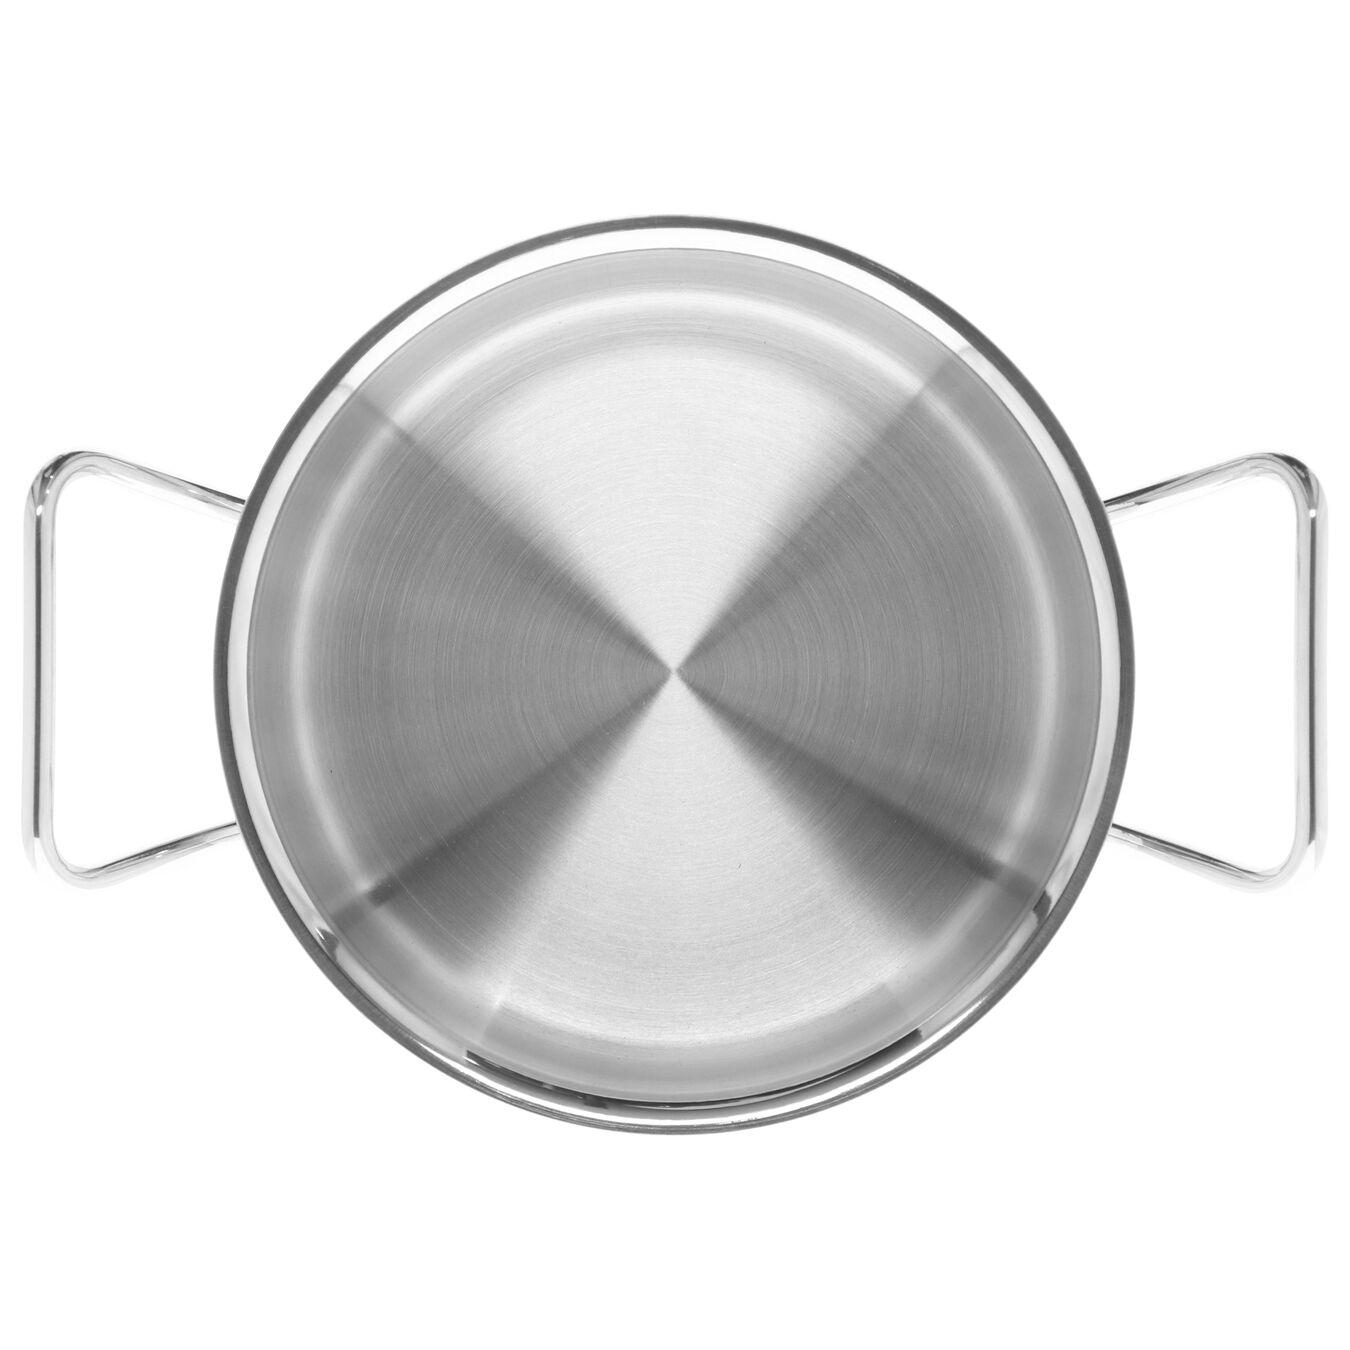 Kookpan met glazen deksel 20 cm / 3 l,,large 2